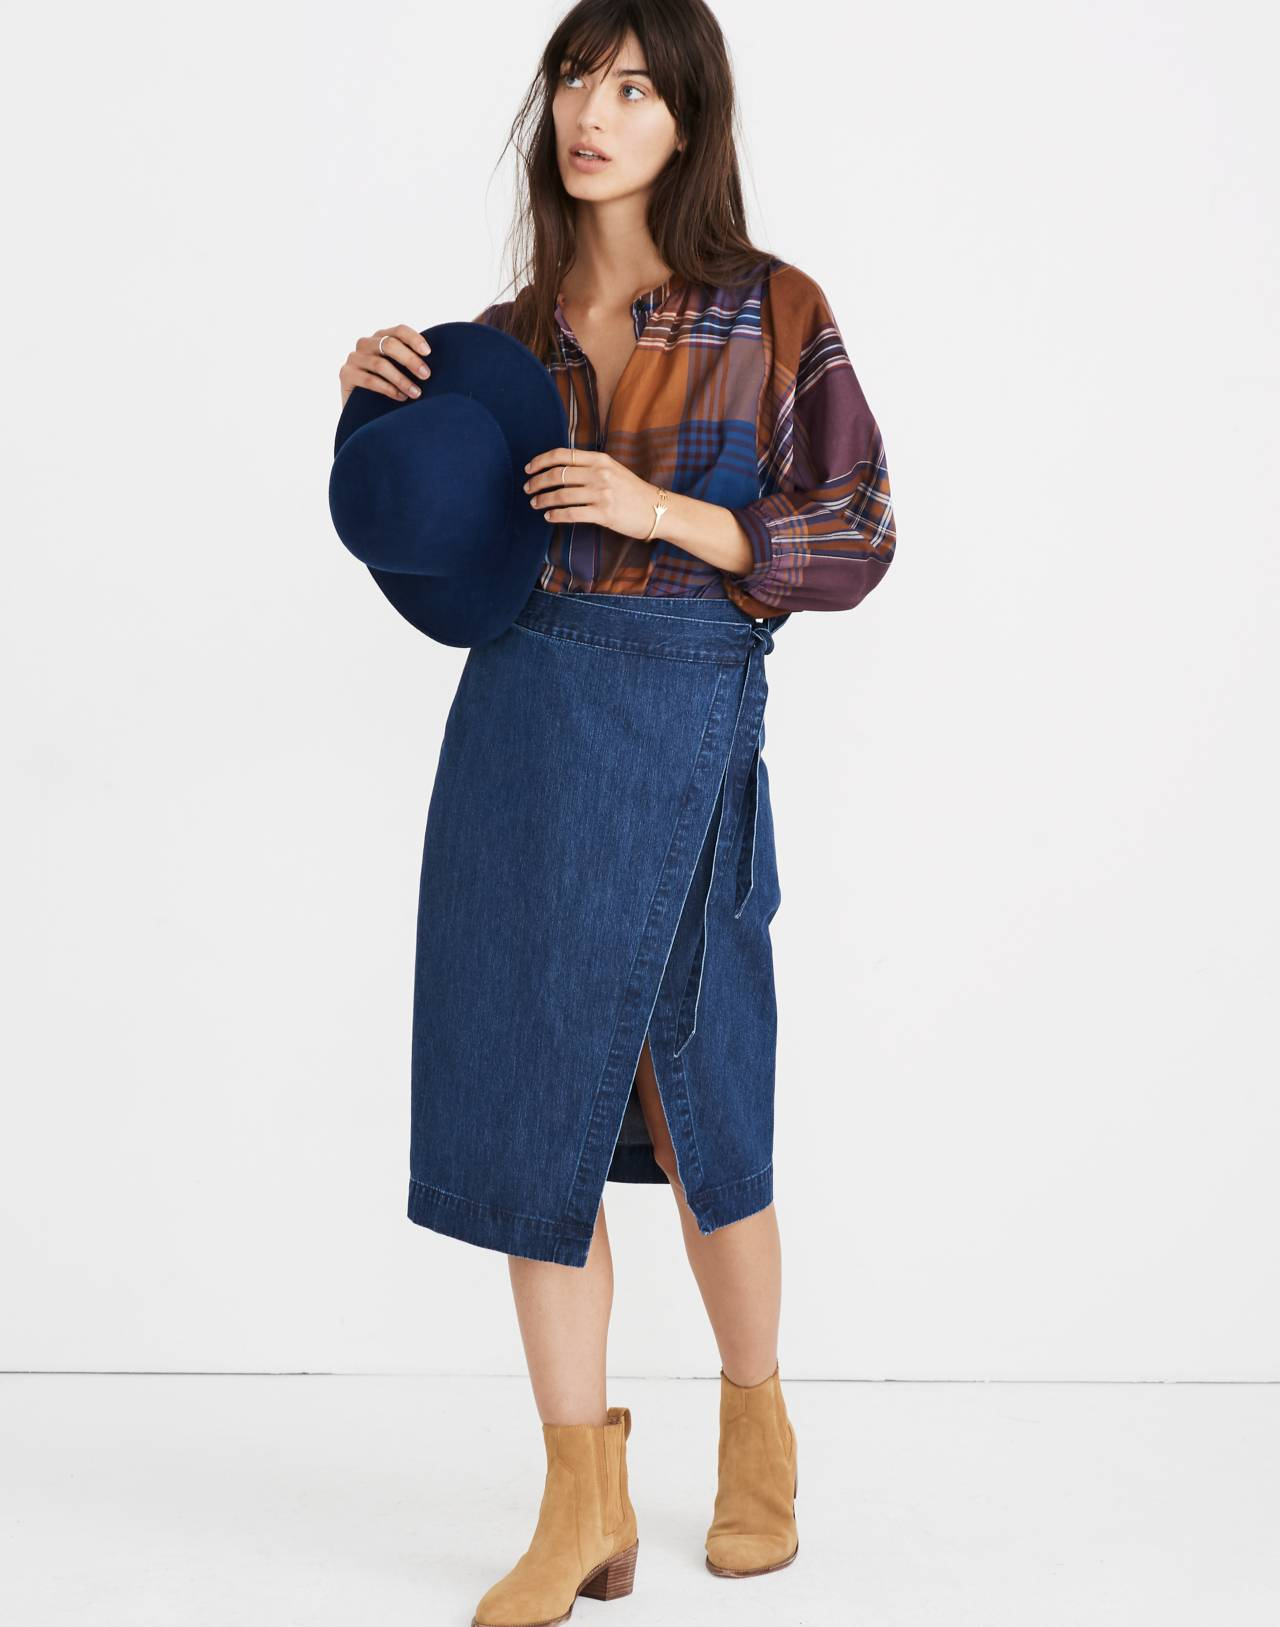 Denim Midi Wrap Skirt in Neville Wash in neville wash image 1